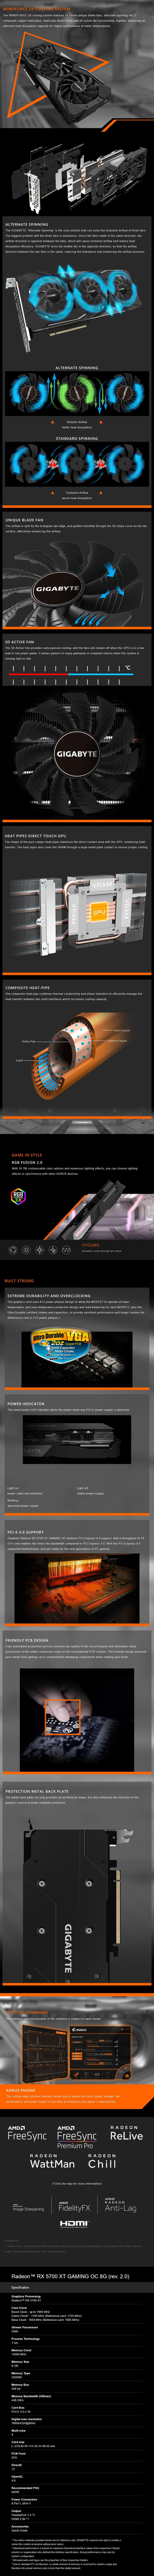 Gigabyte Radeon RX 5700 XT GAMING OC V2 8GB Video Card - Overview 1